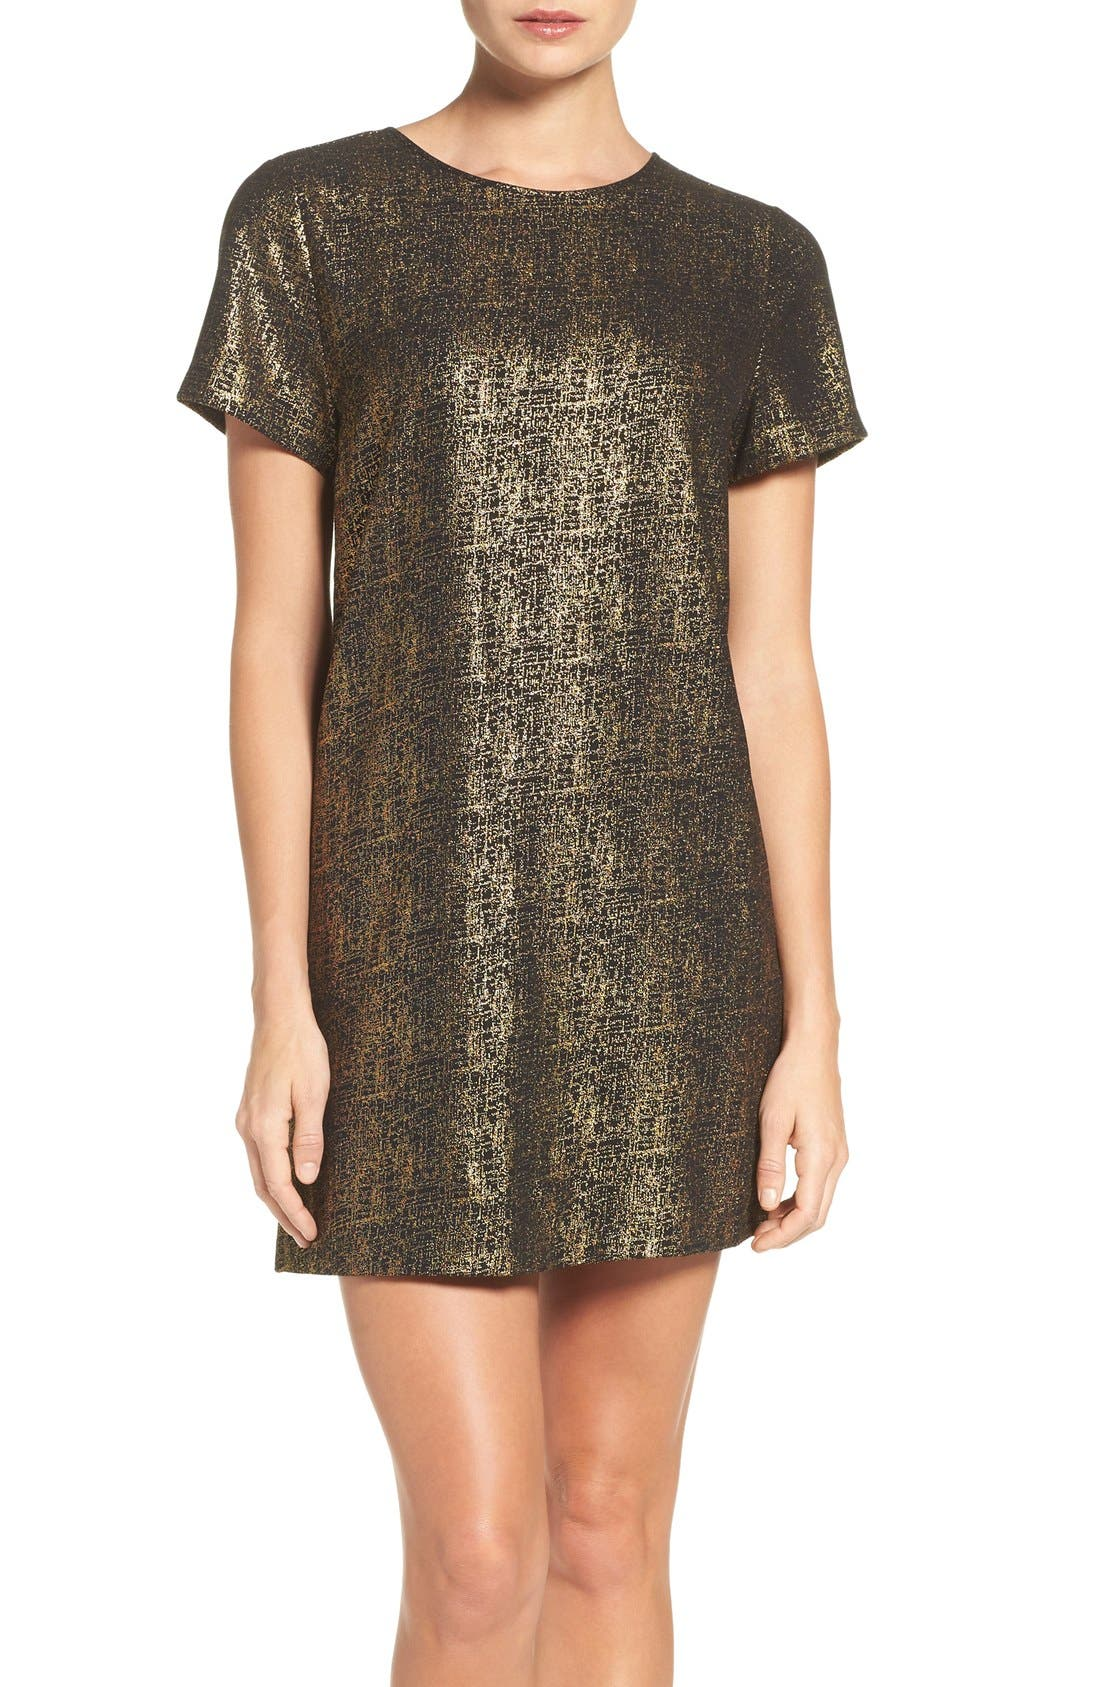 Main Image - Felicity & Coco Amy Metallic Shift Dress (Regular & Petite) (Nordstrom Exclusive)